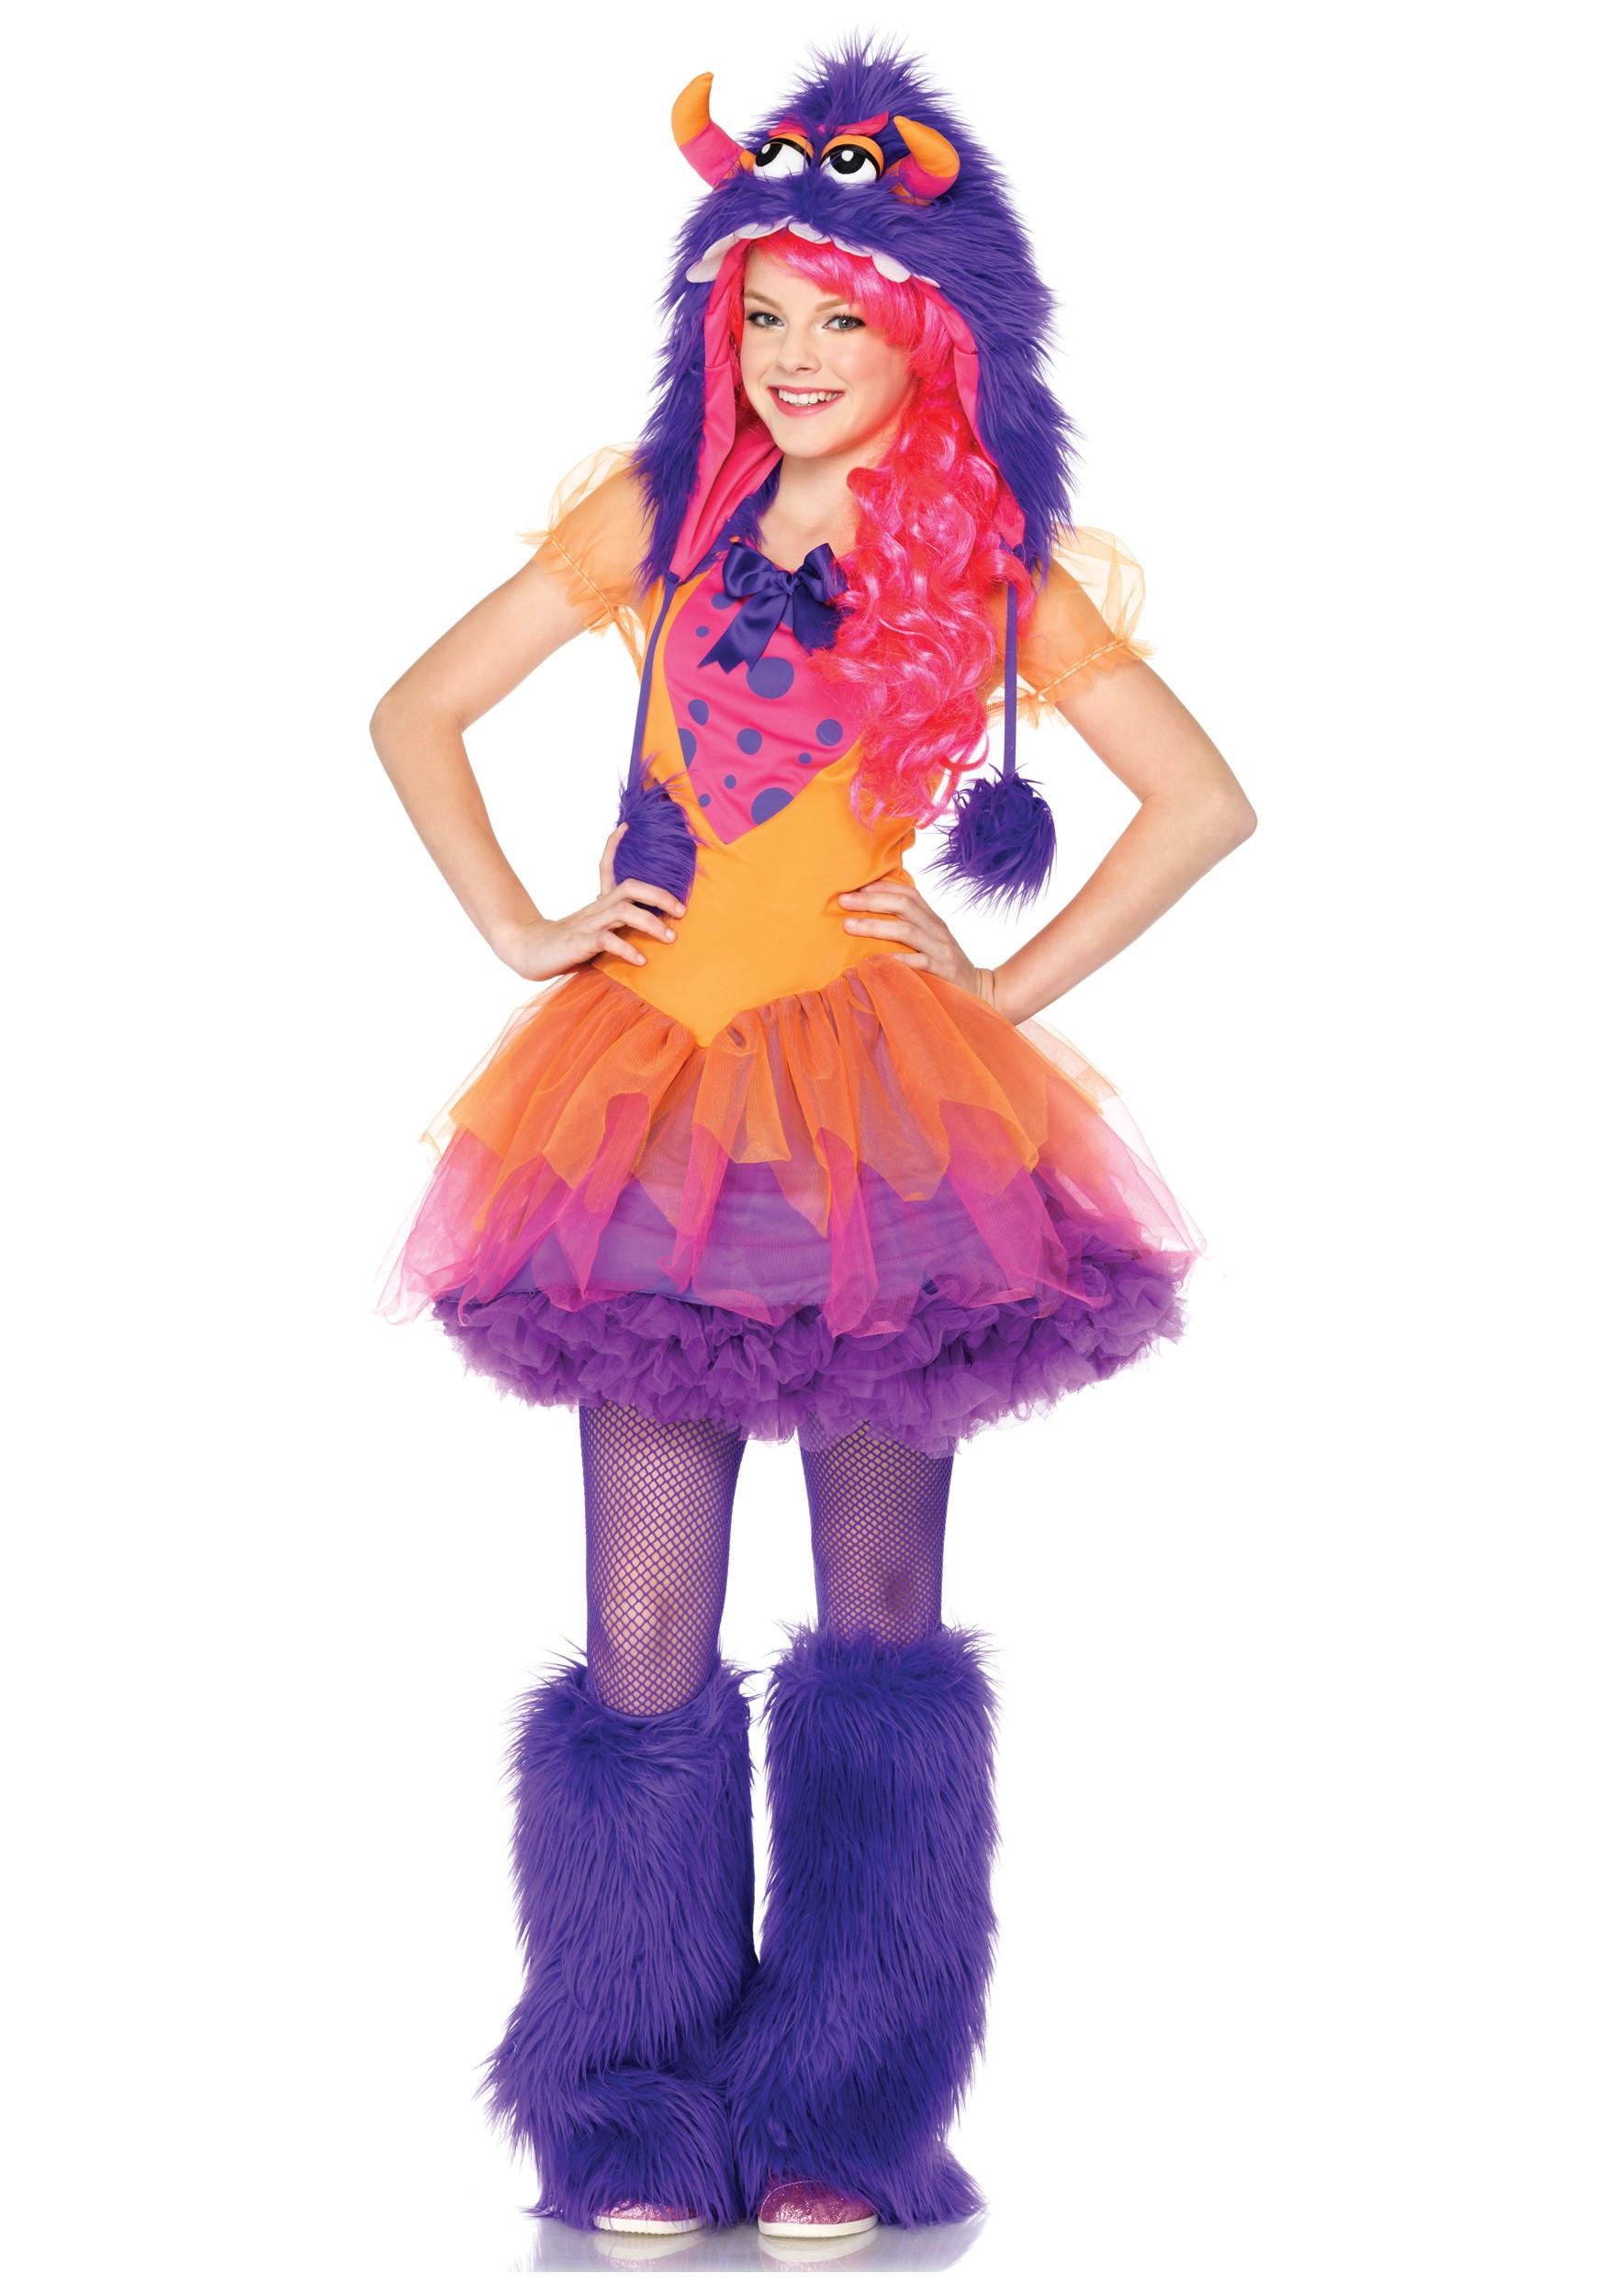 Cute DIY Costumes  Teen Furrocious Frankie Monster Costume